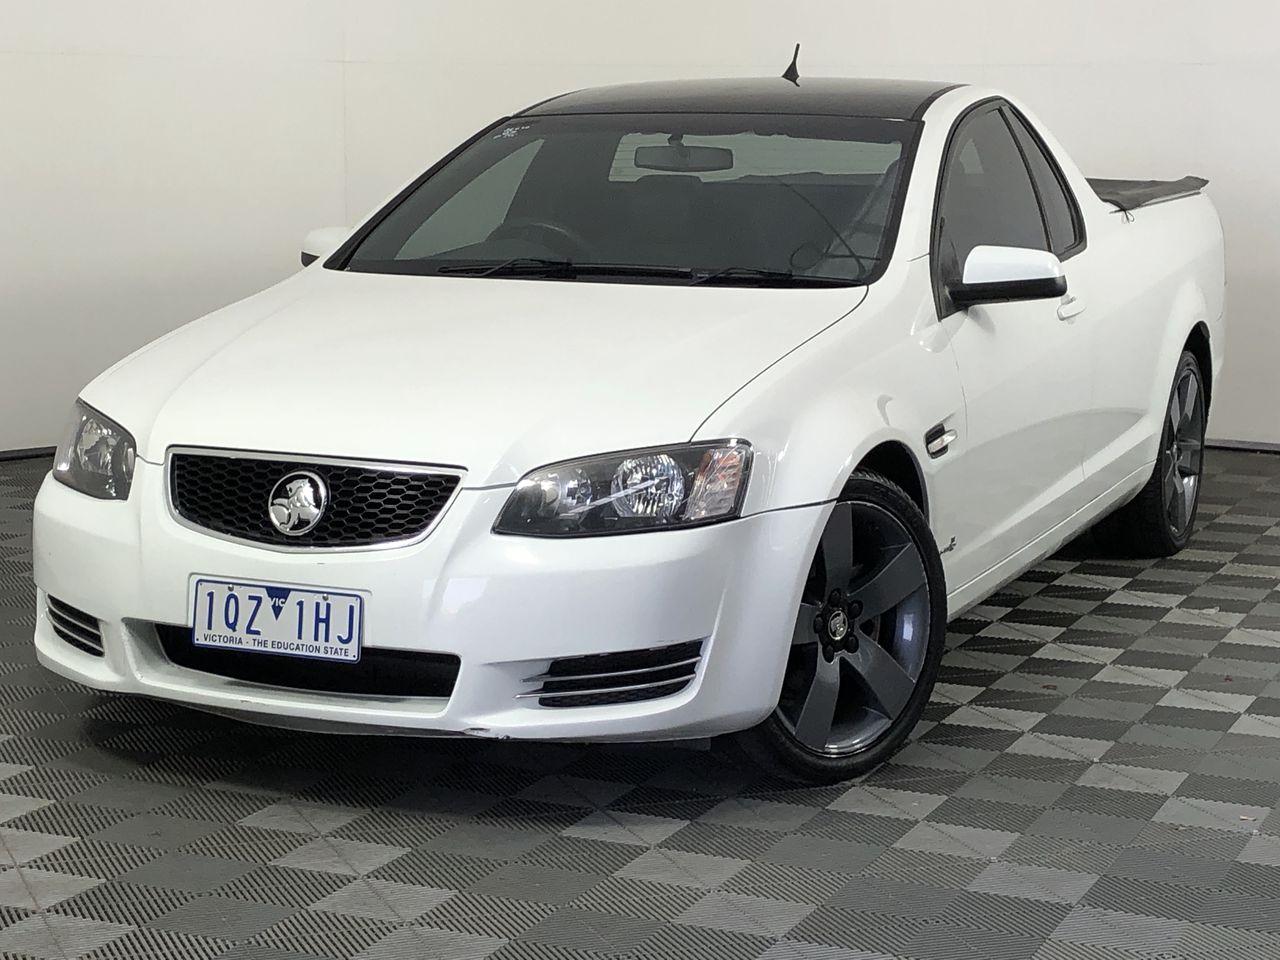 2012 Holden Commodore Omega VE II Automatic Ute